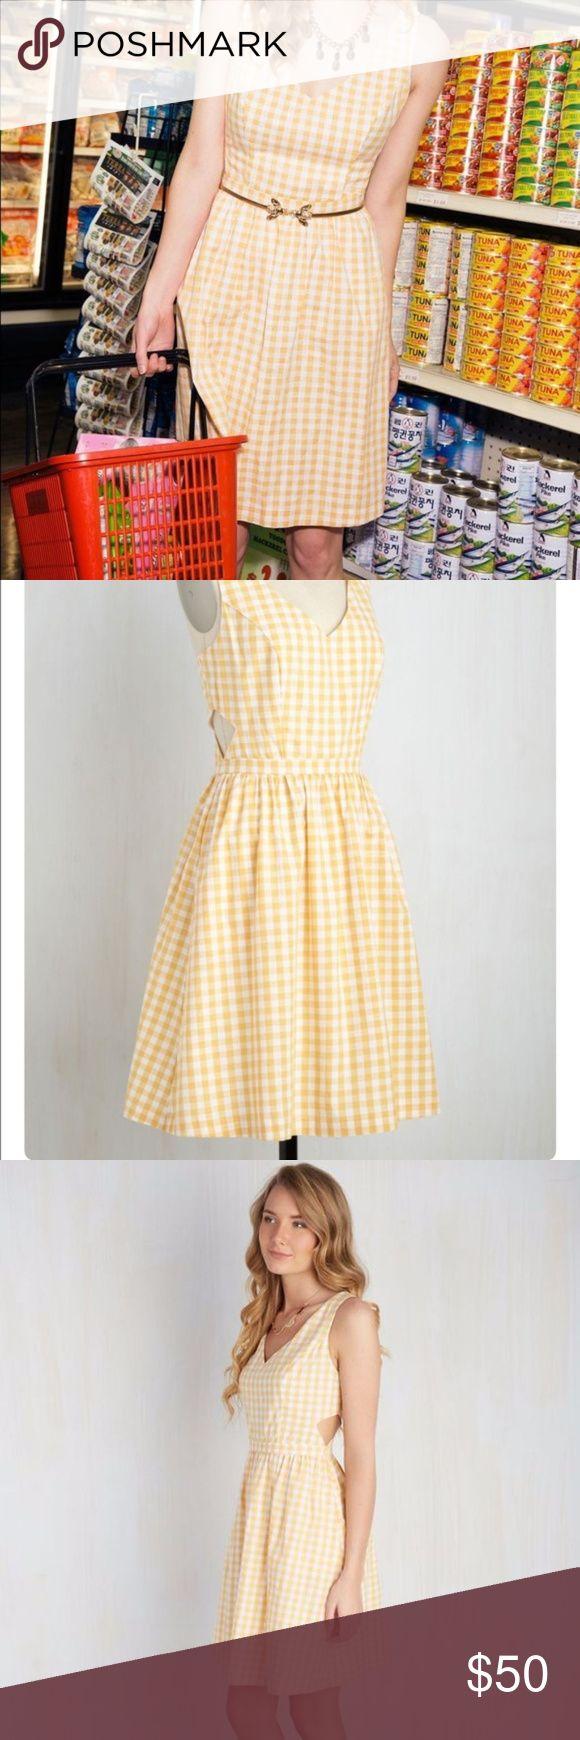 Modcloth Patio My Goodness Dress in Lemonade ModCloth Patio My Goodness yellow l…